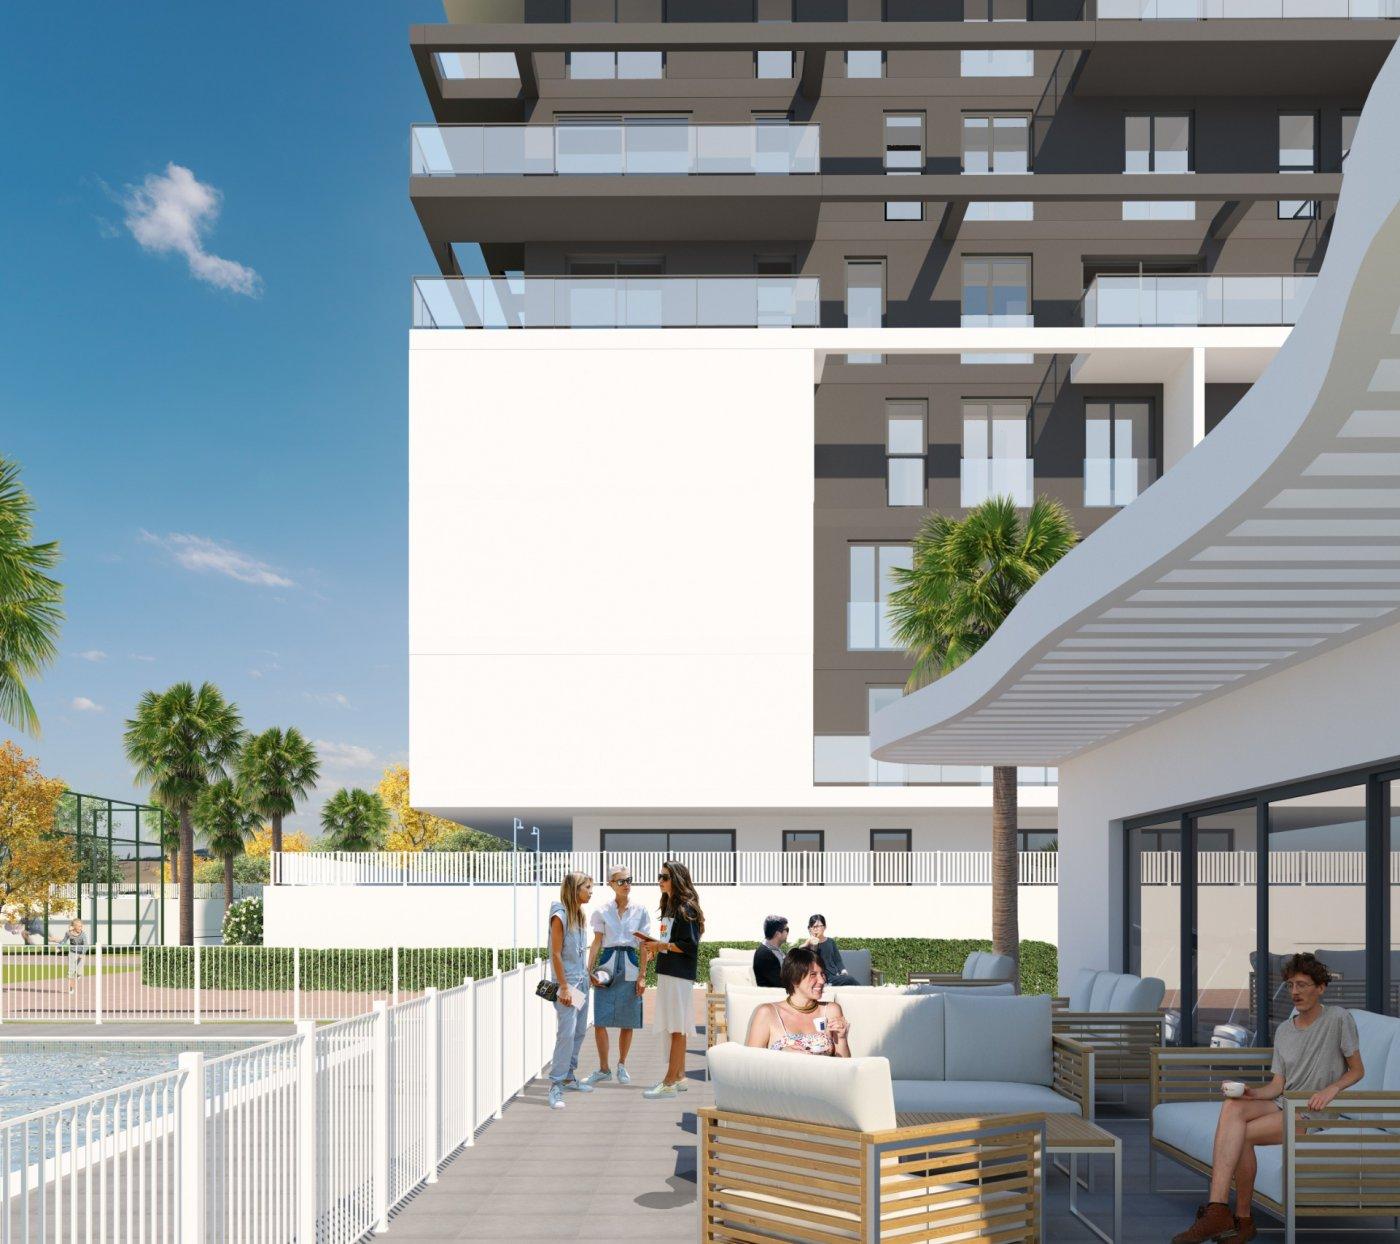 Estate Agents Moraira – Property for sale in Moraira – Apartment – Saladar – Calpe